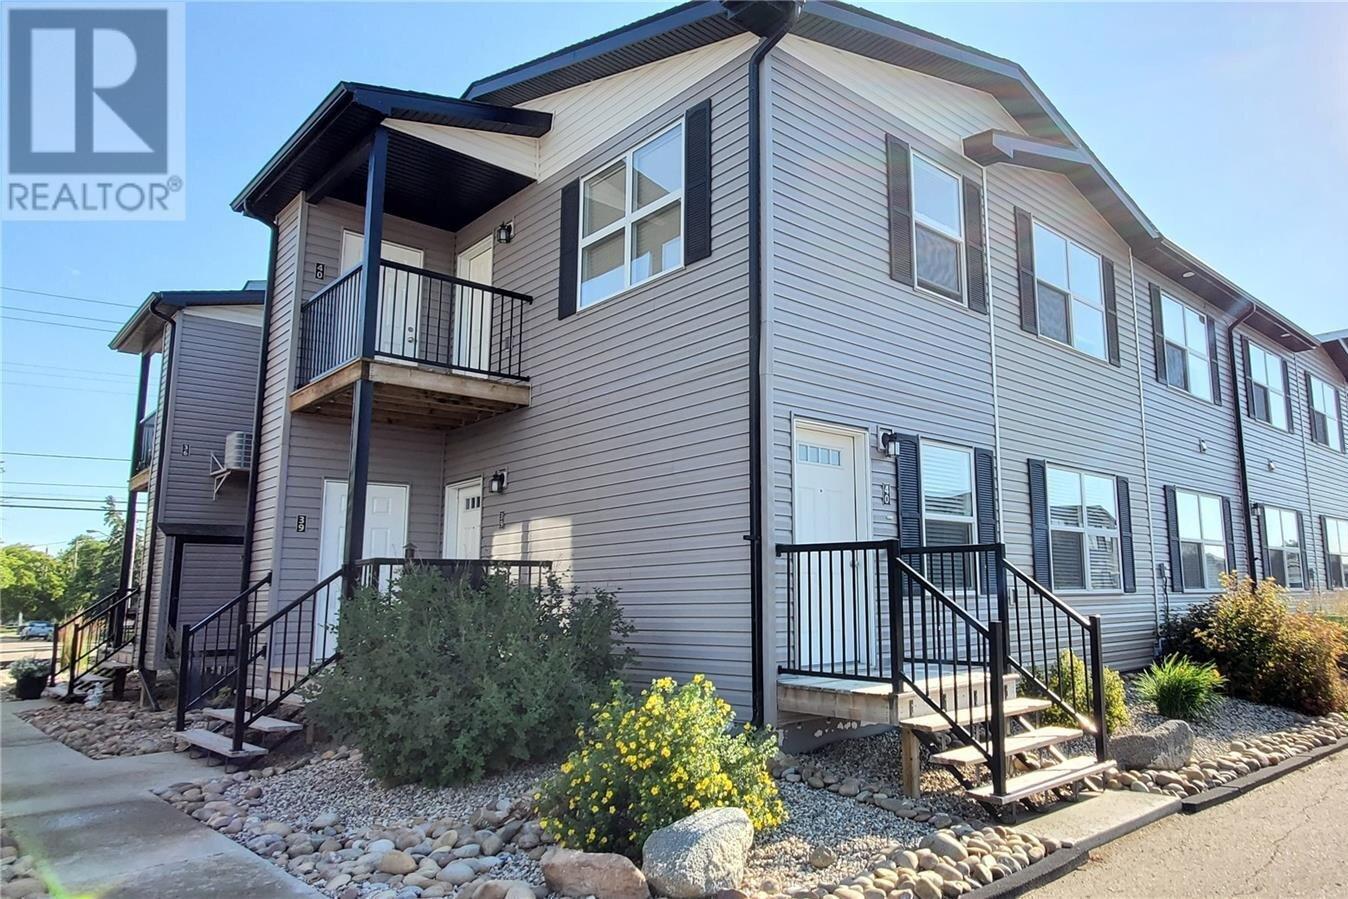 Townhouse for sale at 1275 South Railway St E Unit 40 Swift Current Saskatchewan - MLS: SK818965